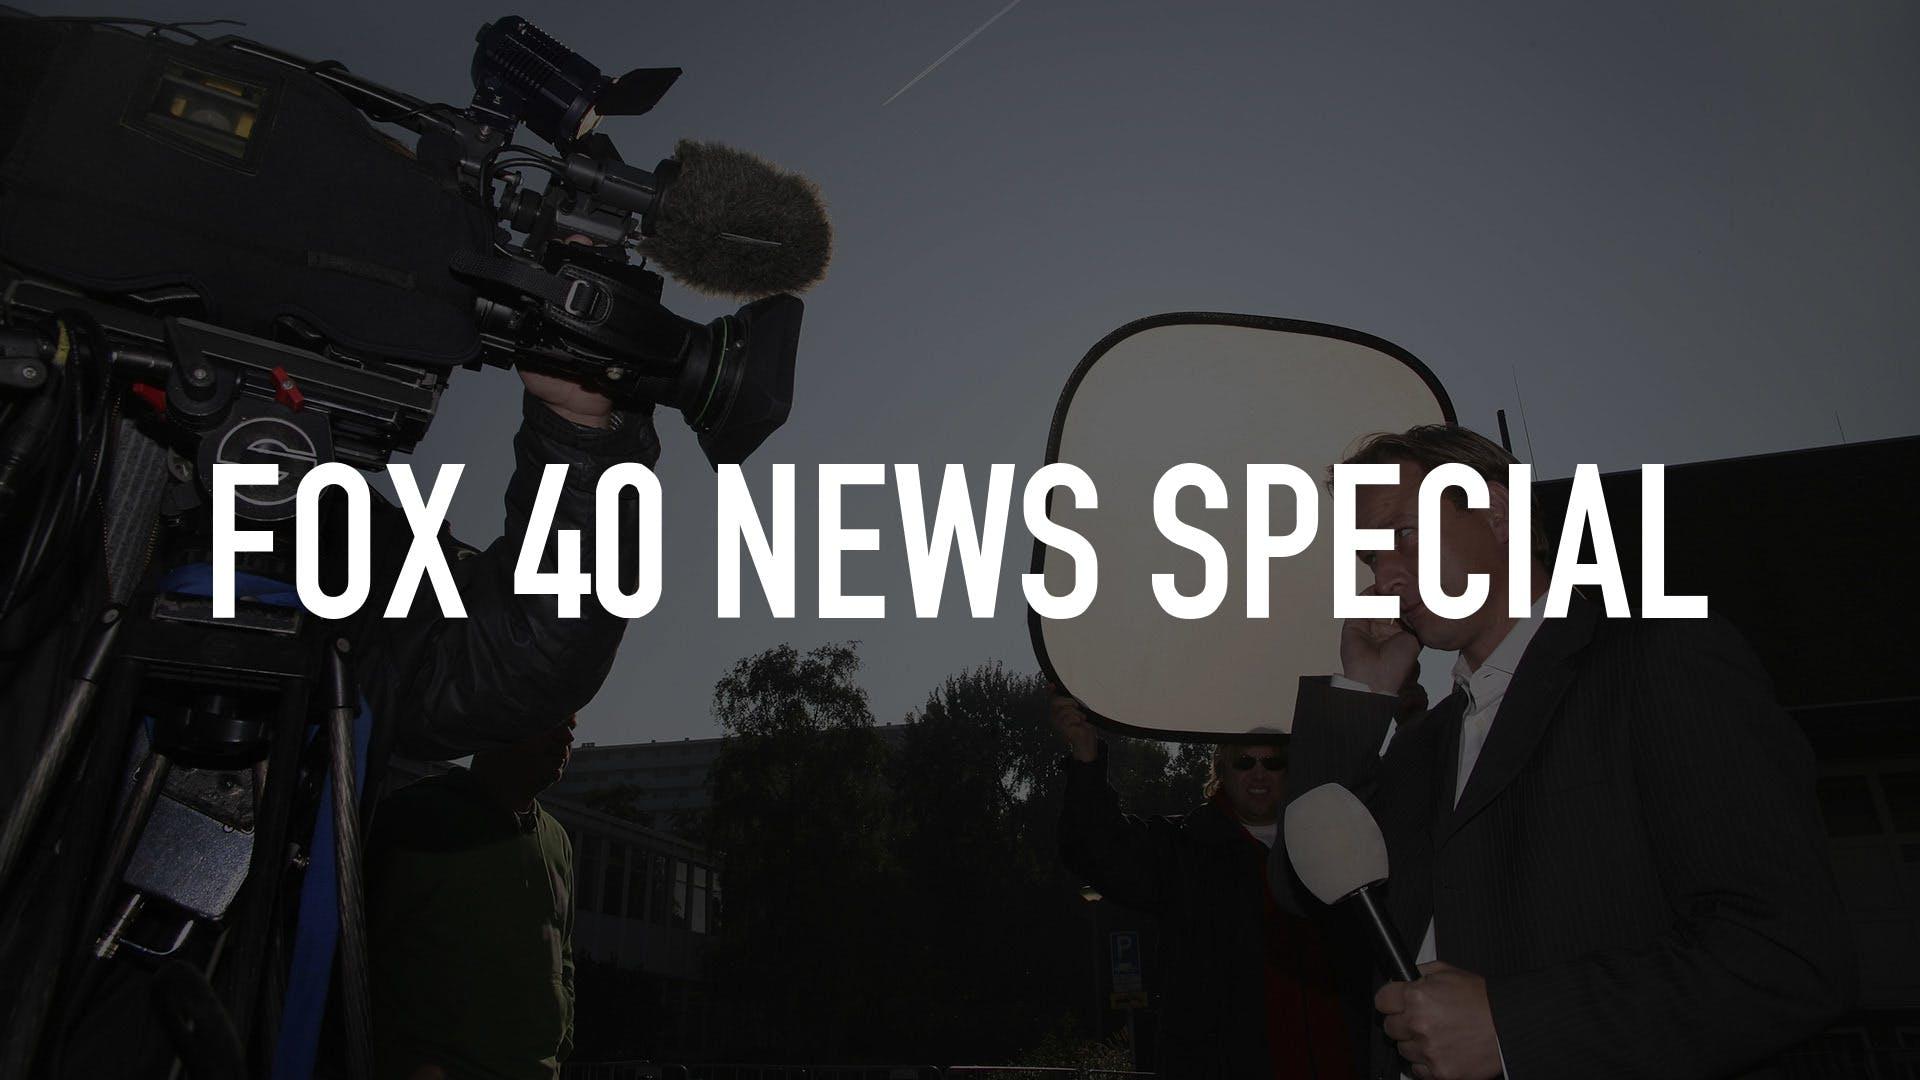 Watch FOX 40 News Special | Stream on fuboTV (Free Trial)